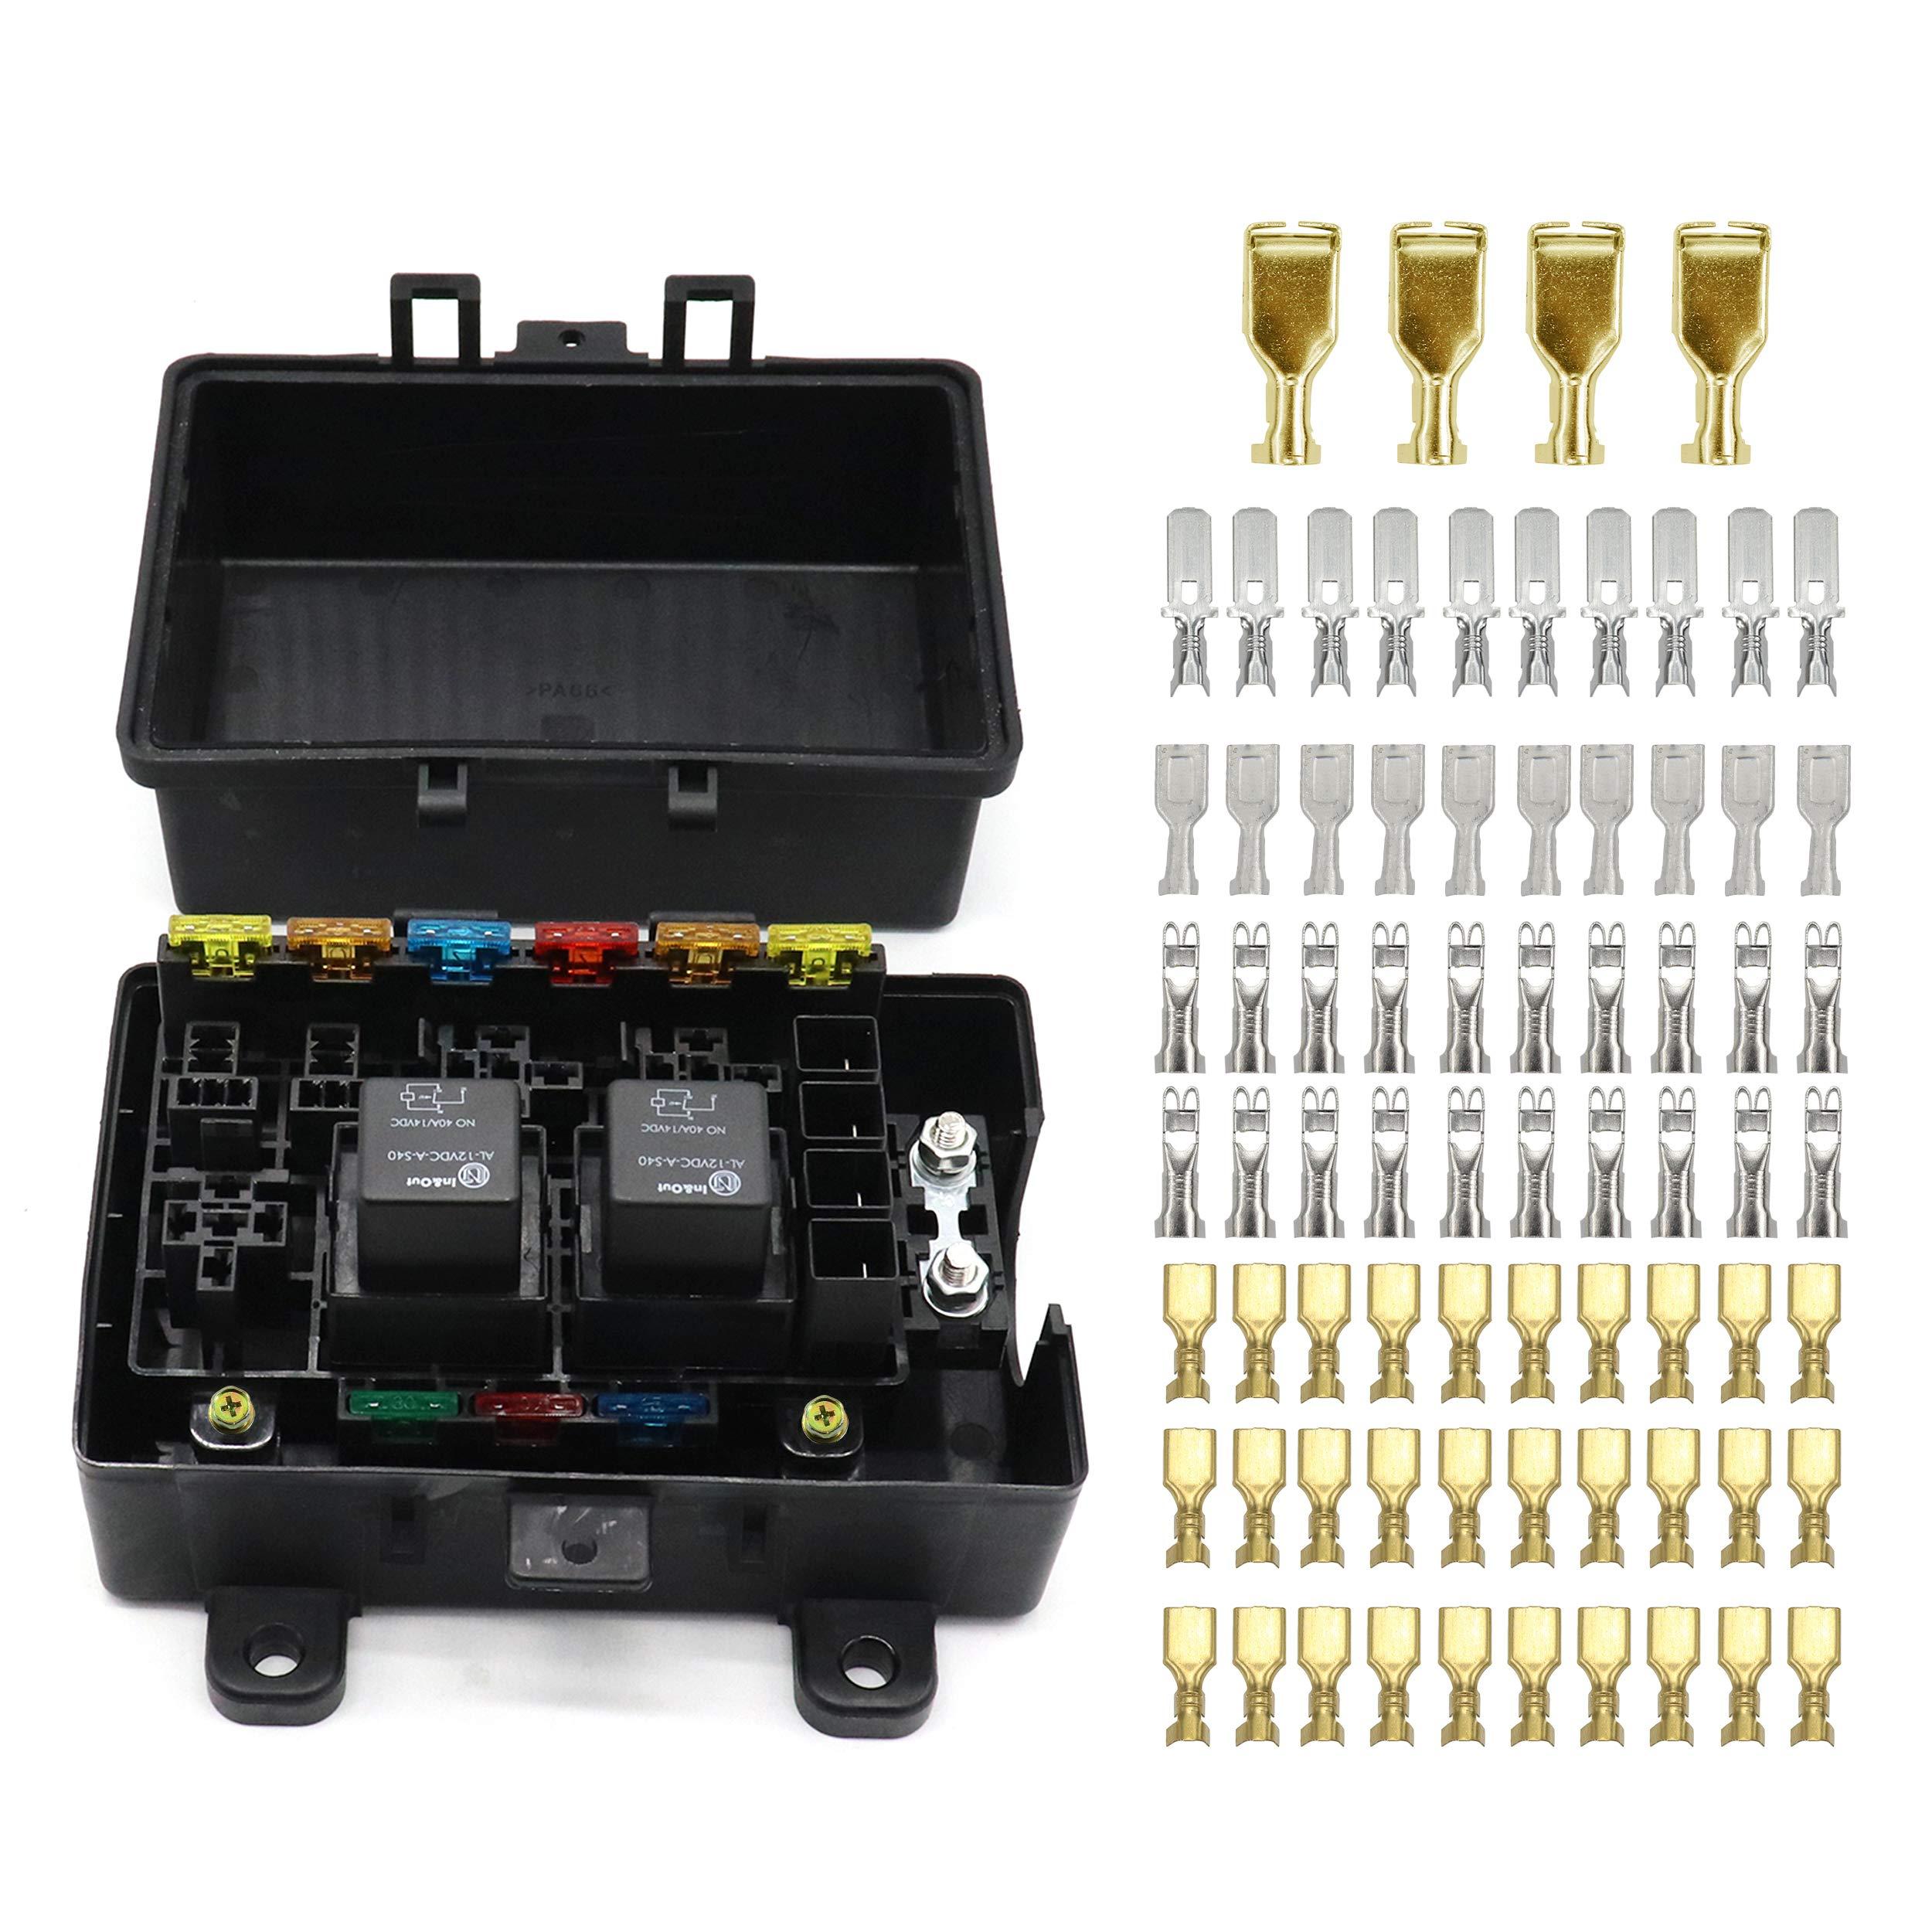 galleon 21 slot relay fuse box relay ato atc fuse holder car fuse box relay holder fuse box terminals #1